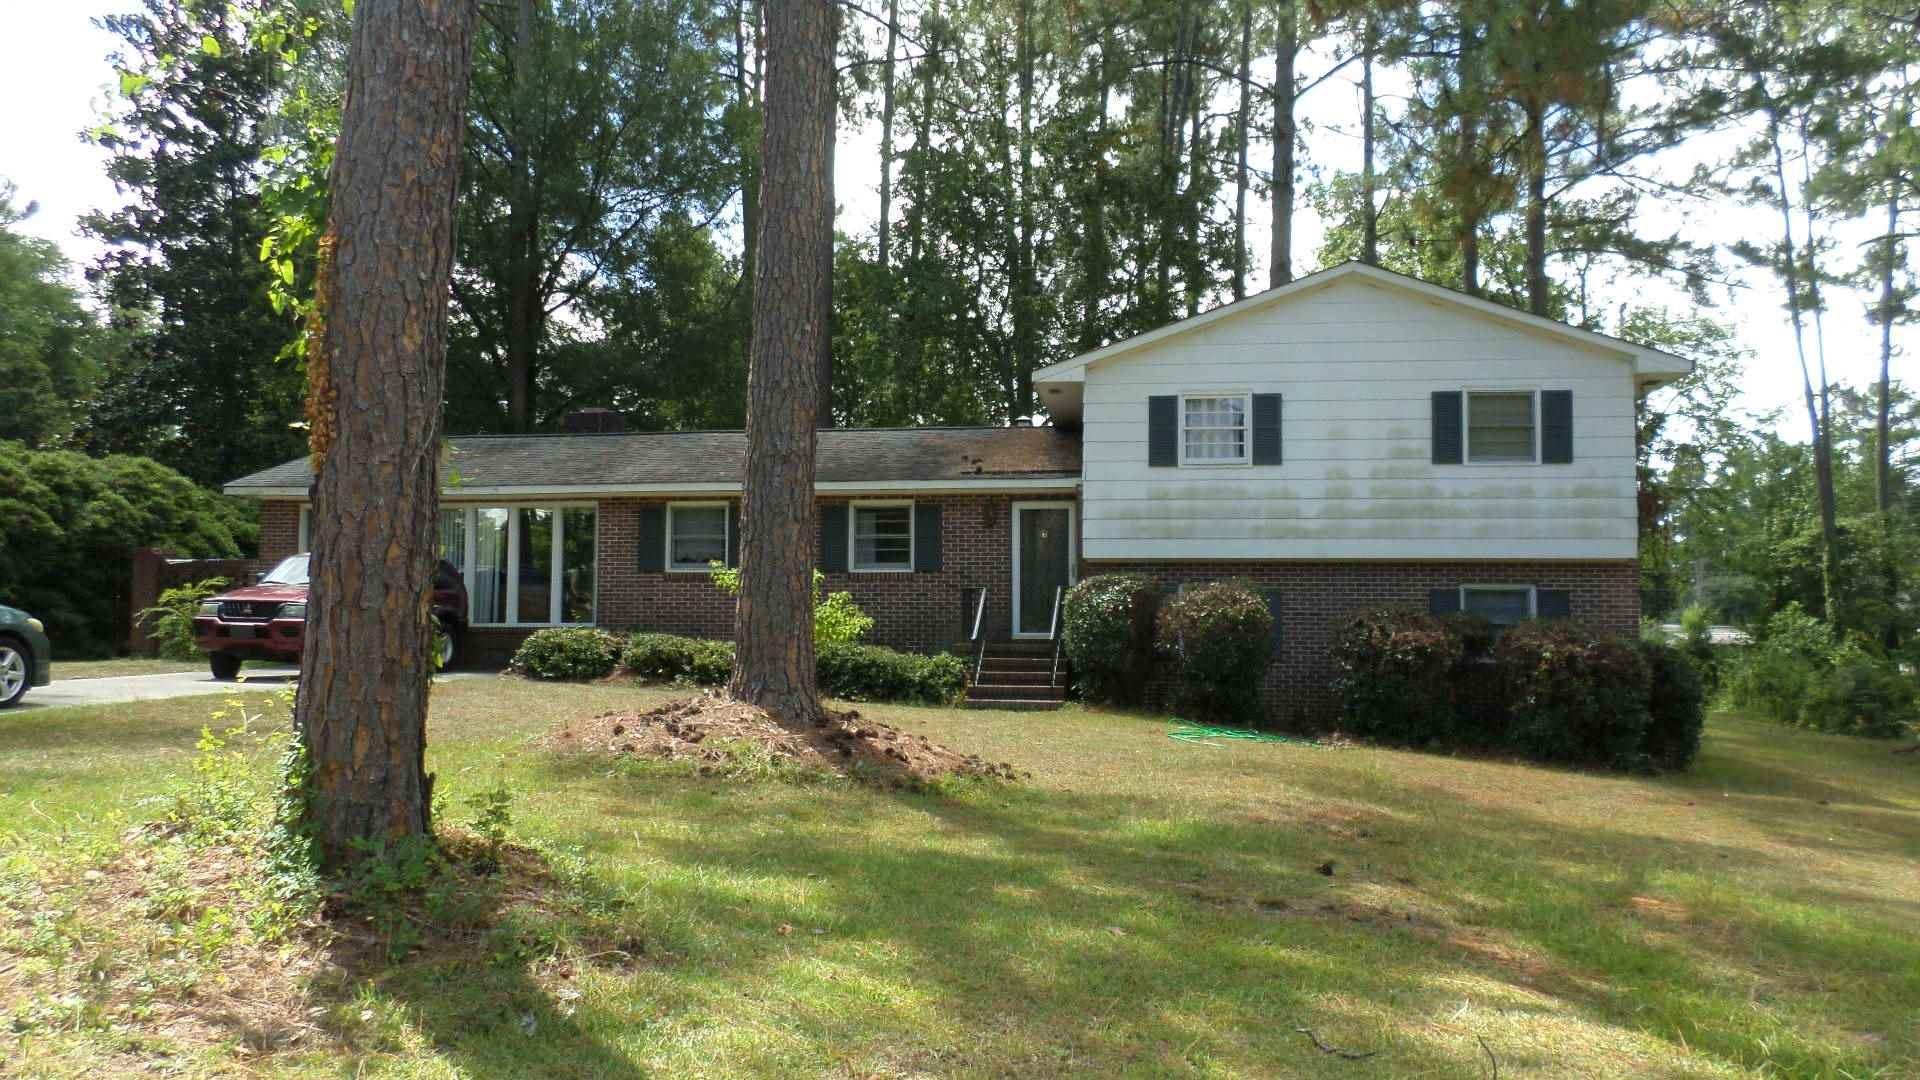 1707 Briarcliff Ct, Milledgeville, GA 31061 - #: 8863675